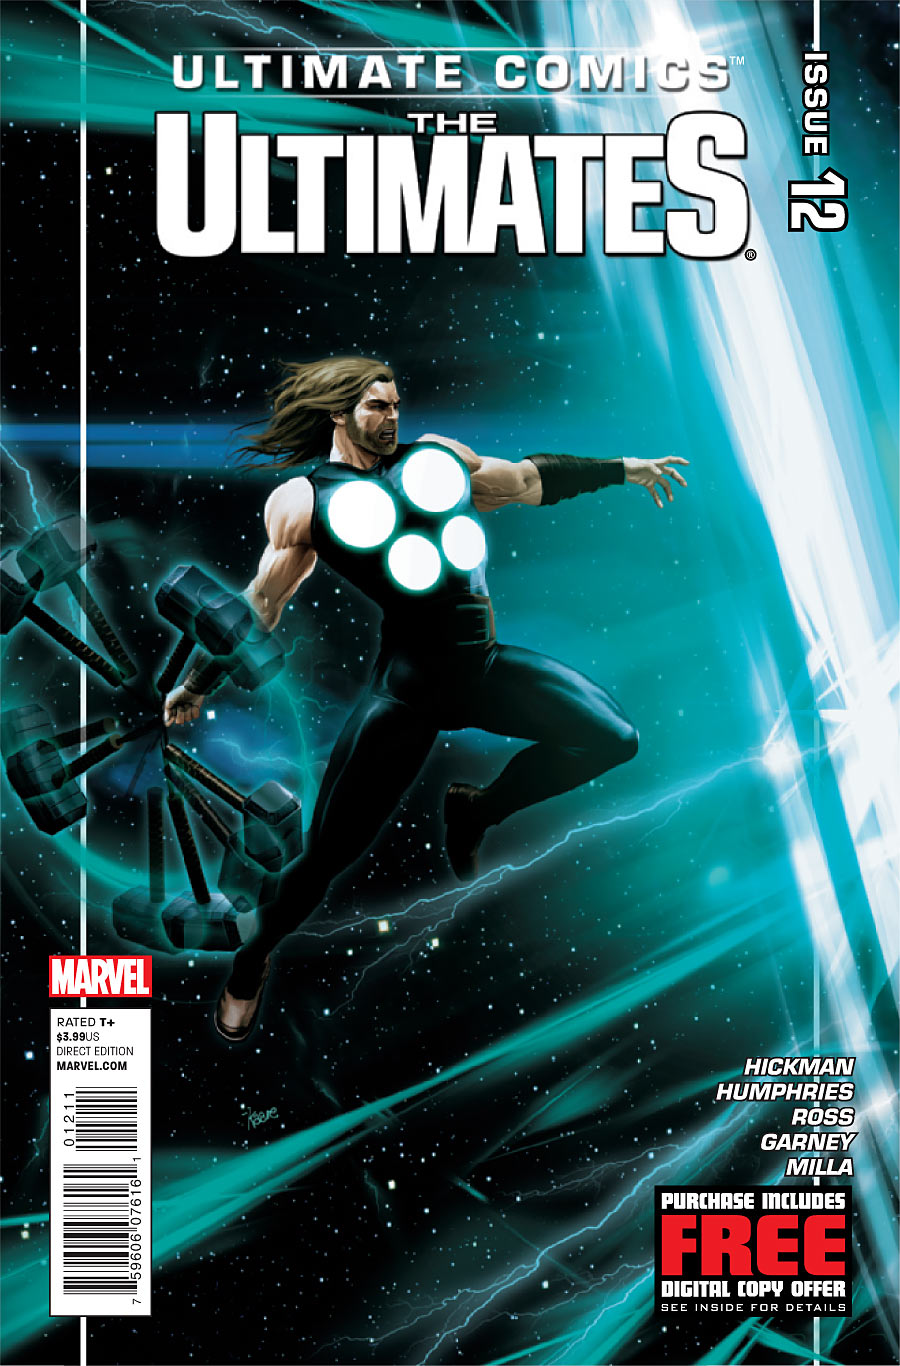 Ultimate Comics Ultimates Vol 1 12